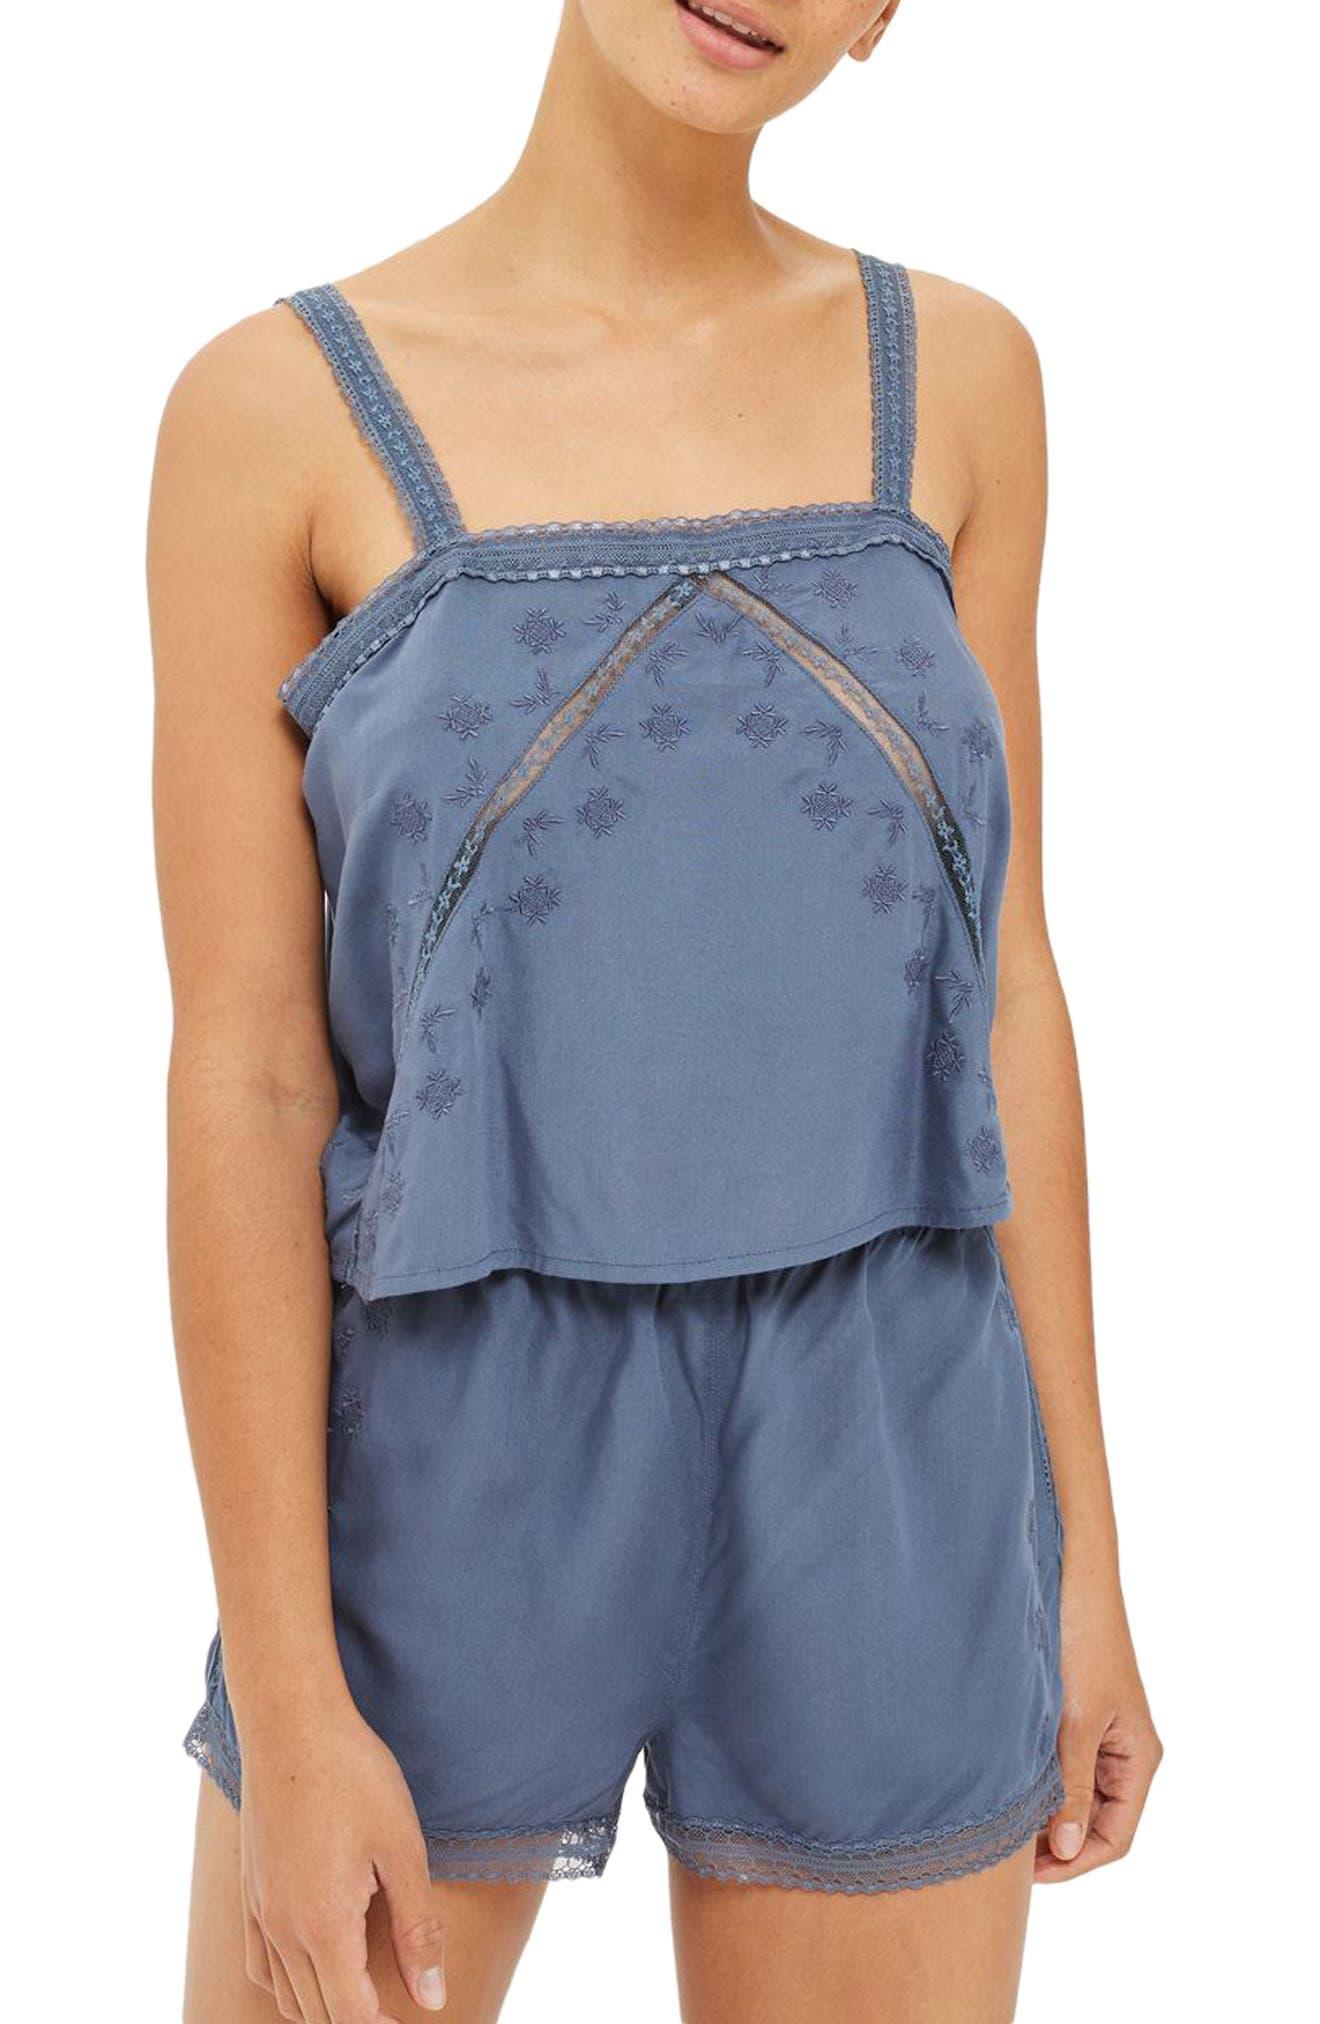 Slate Broderie Camisole & Sleep Shorts,                         Main,                         color, 020